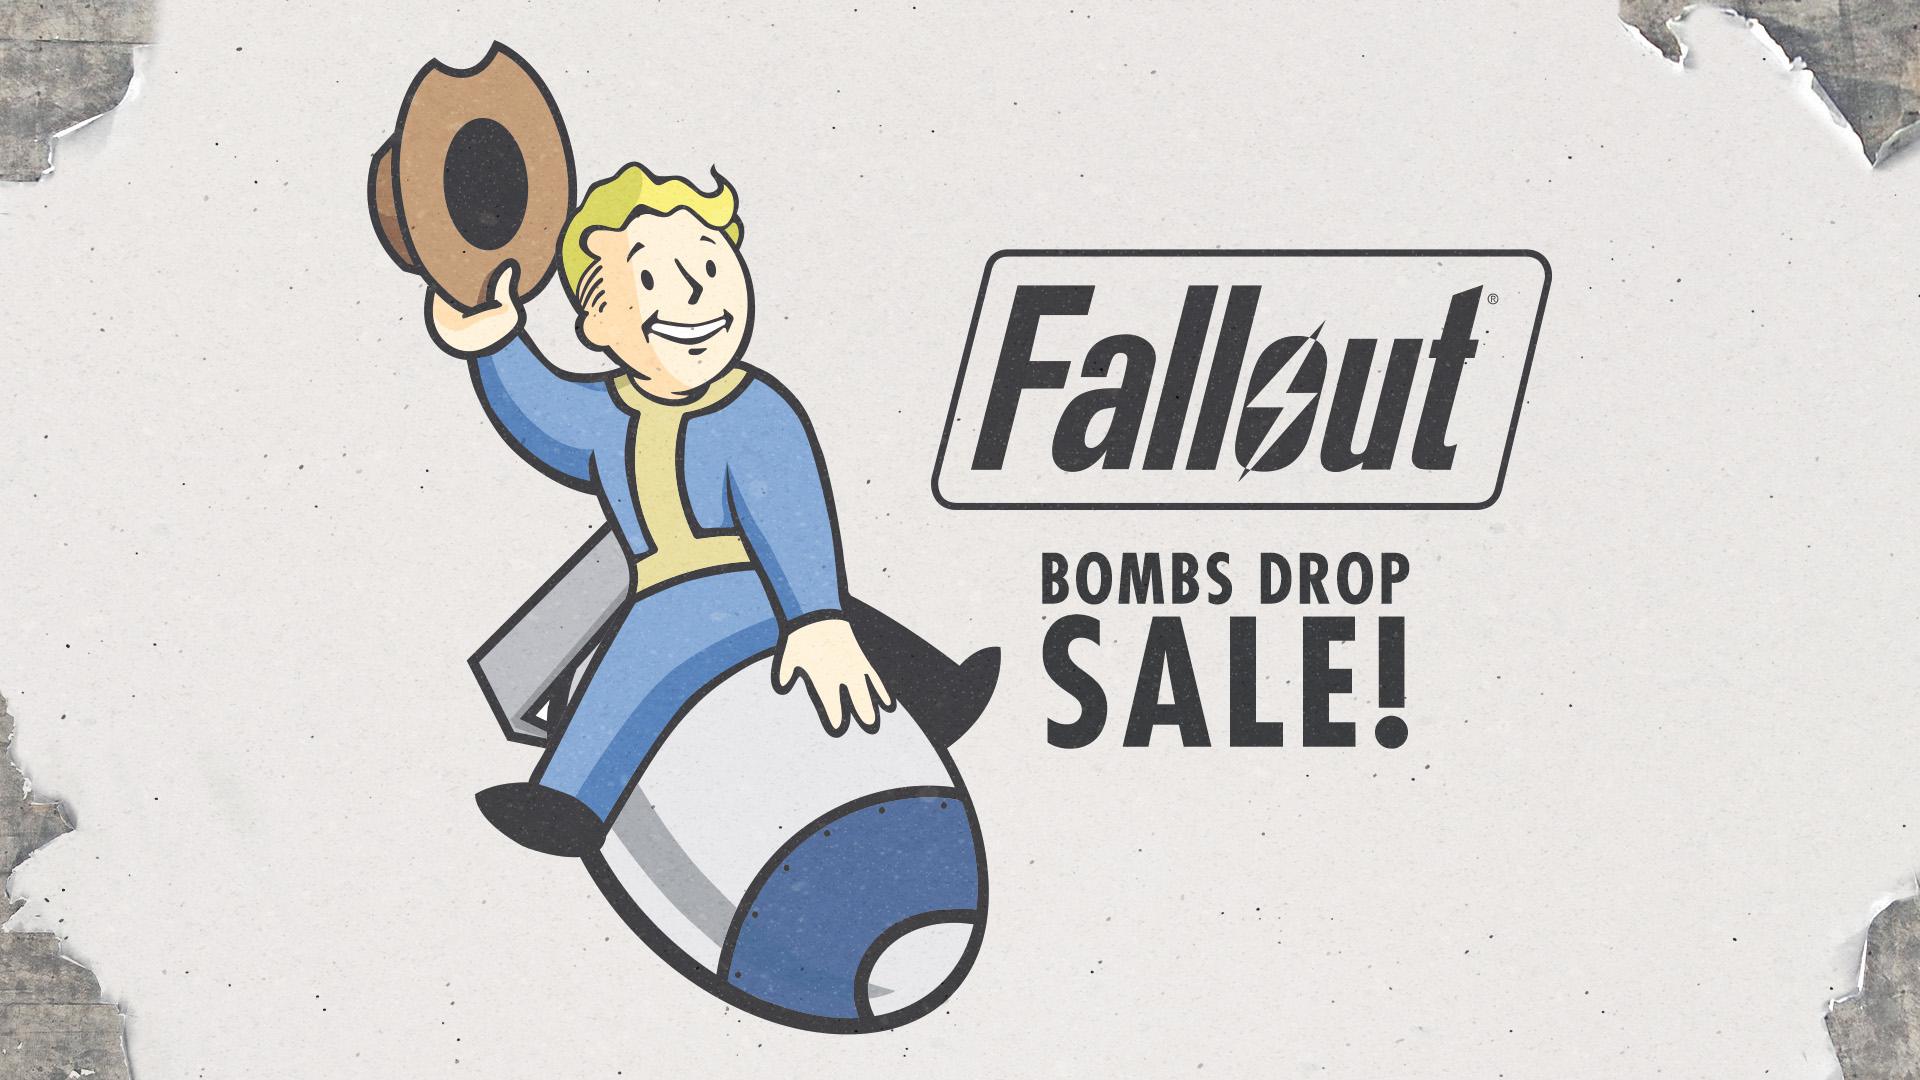 Toda la franquicia de Fallout en oferta (Steam)